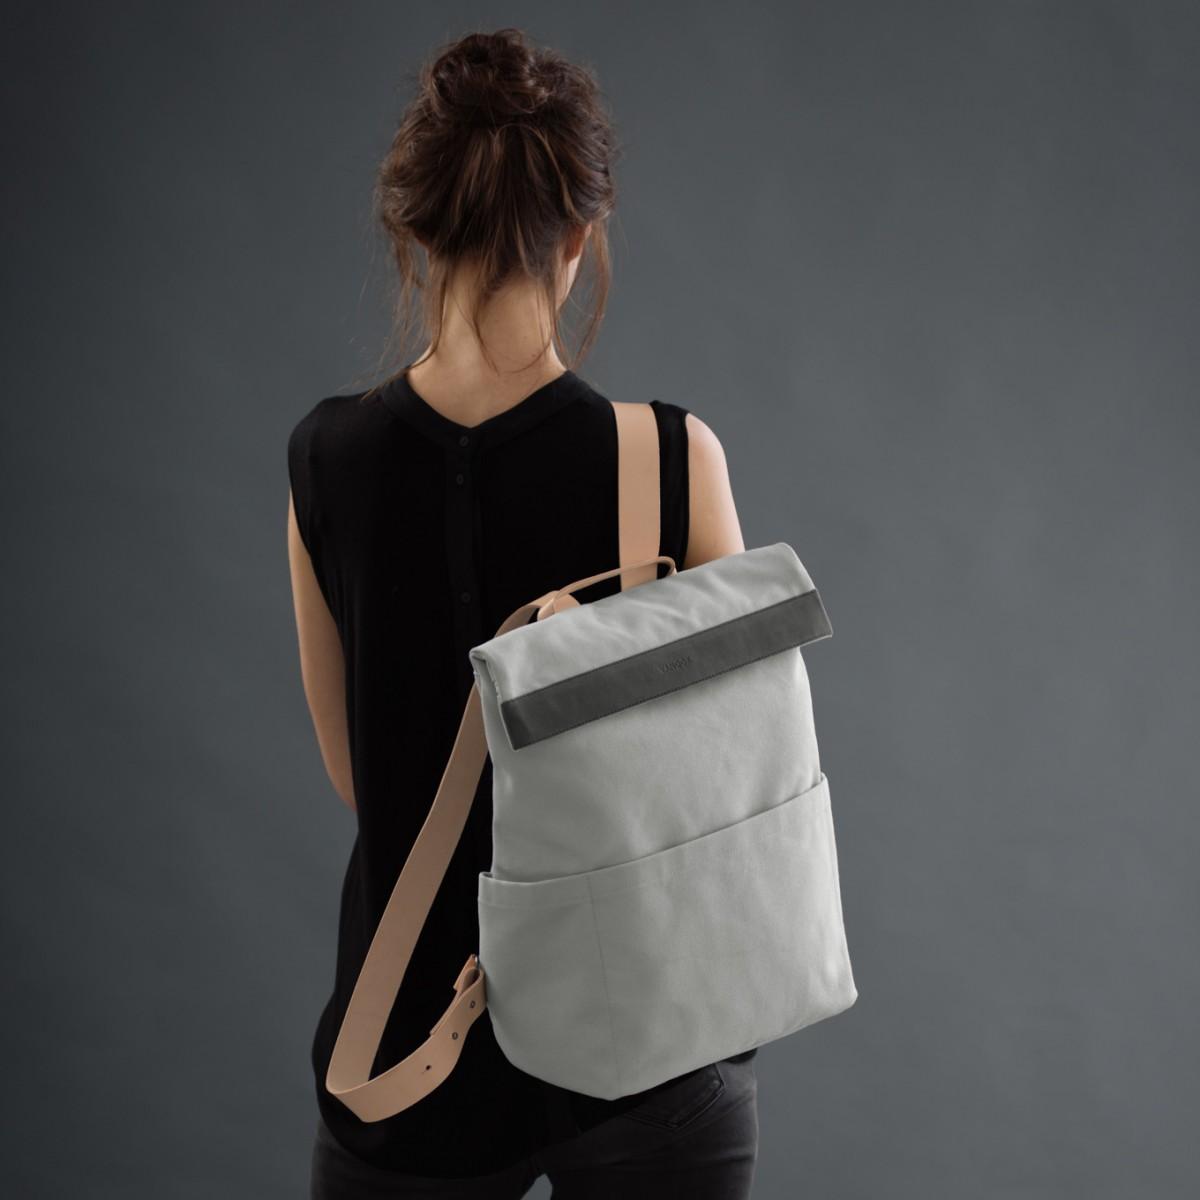 VANOOK Backpack RegularGrey/Nude